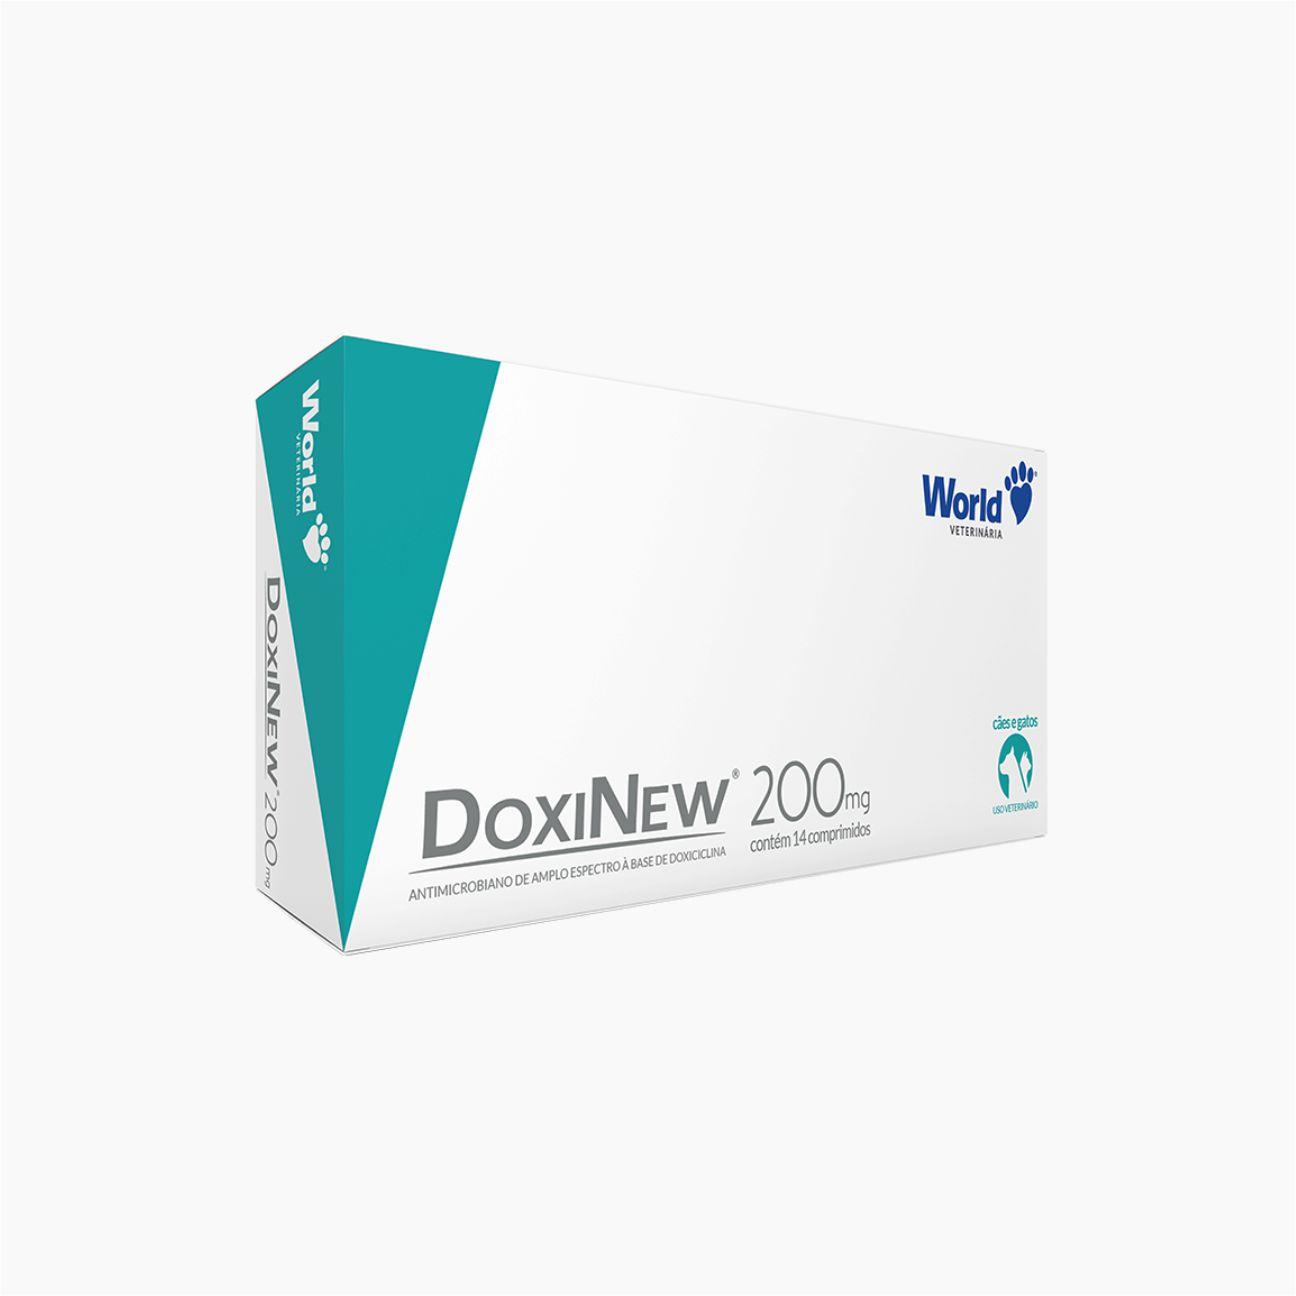 Doxinew 200mg